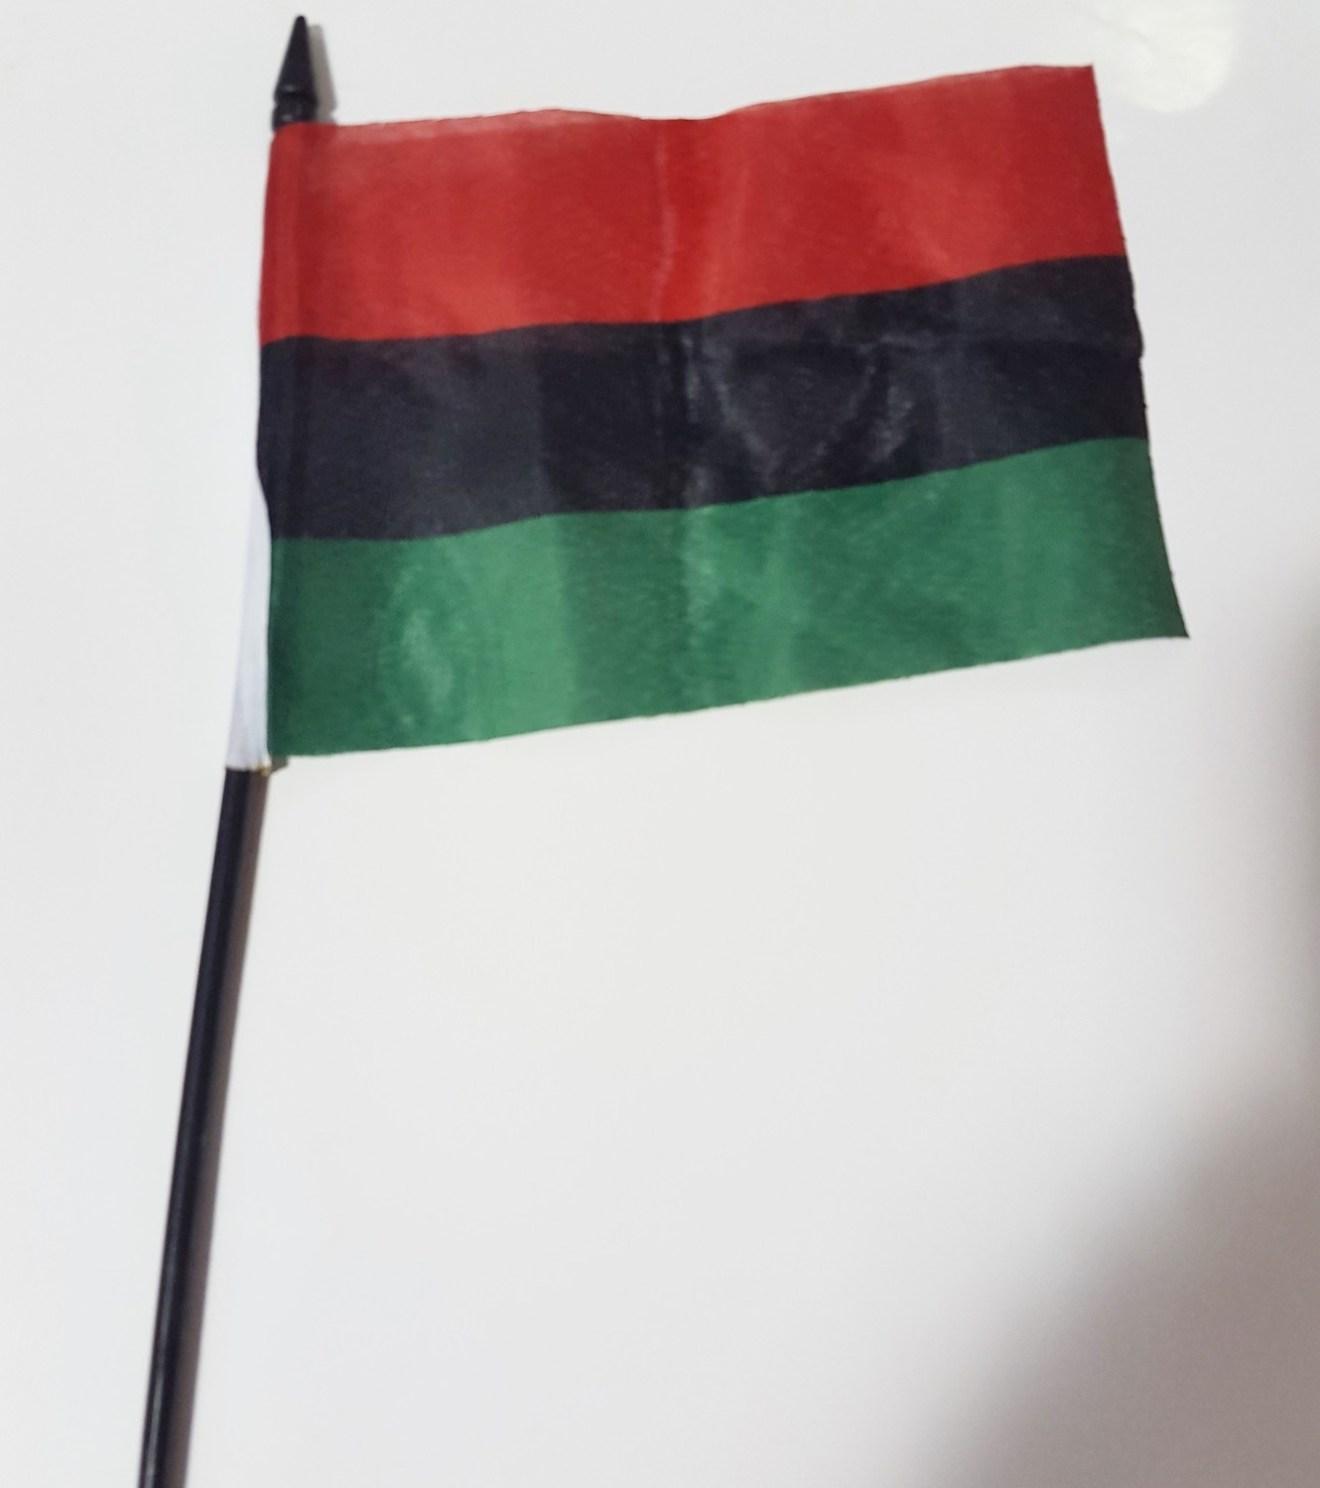 4 x 6 RBG Flag on a Stick